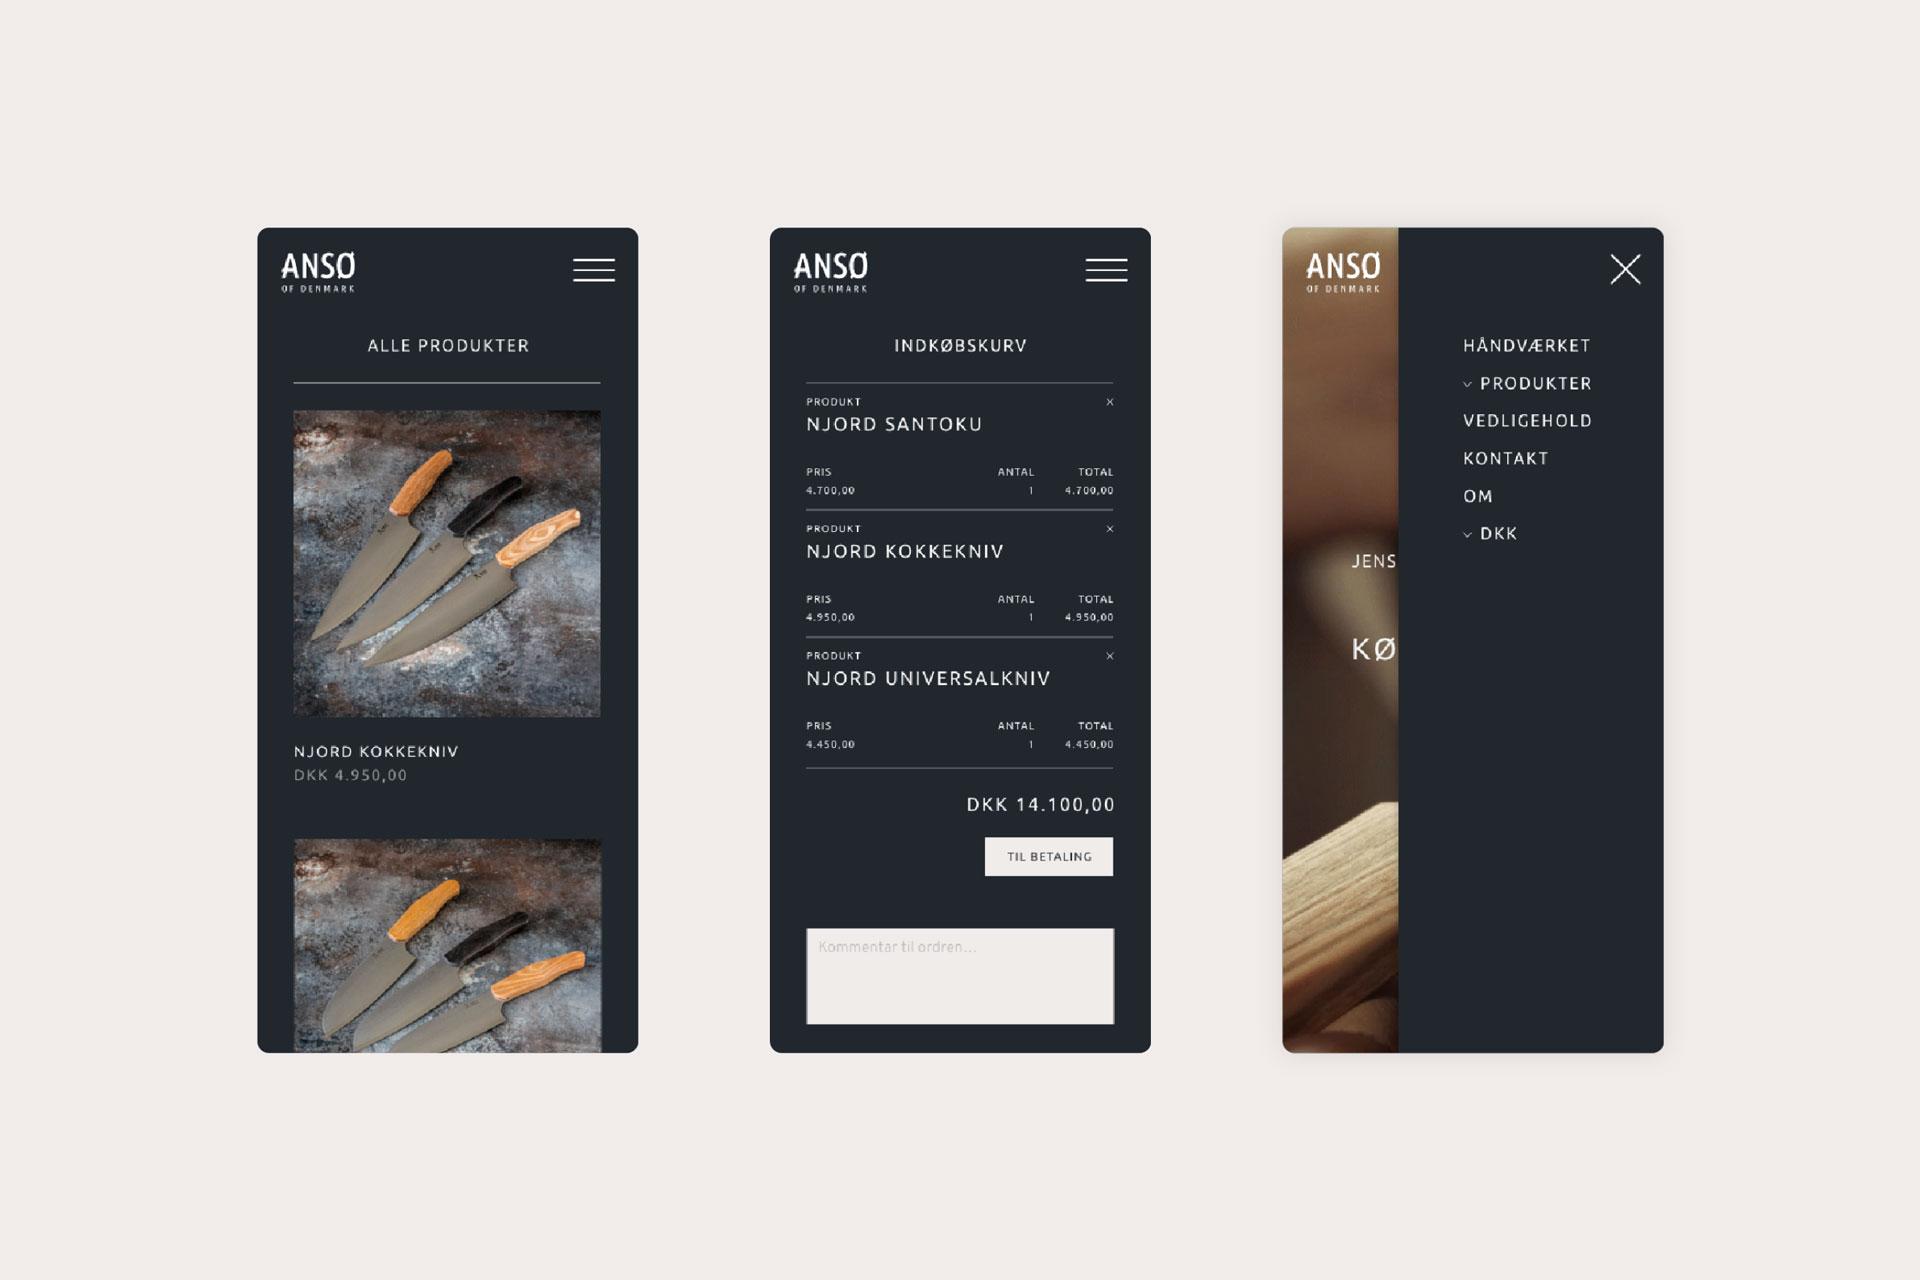 Webshop on mobile selling kitchen knives